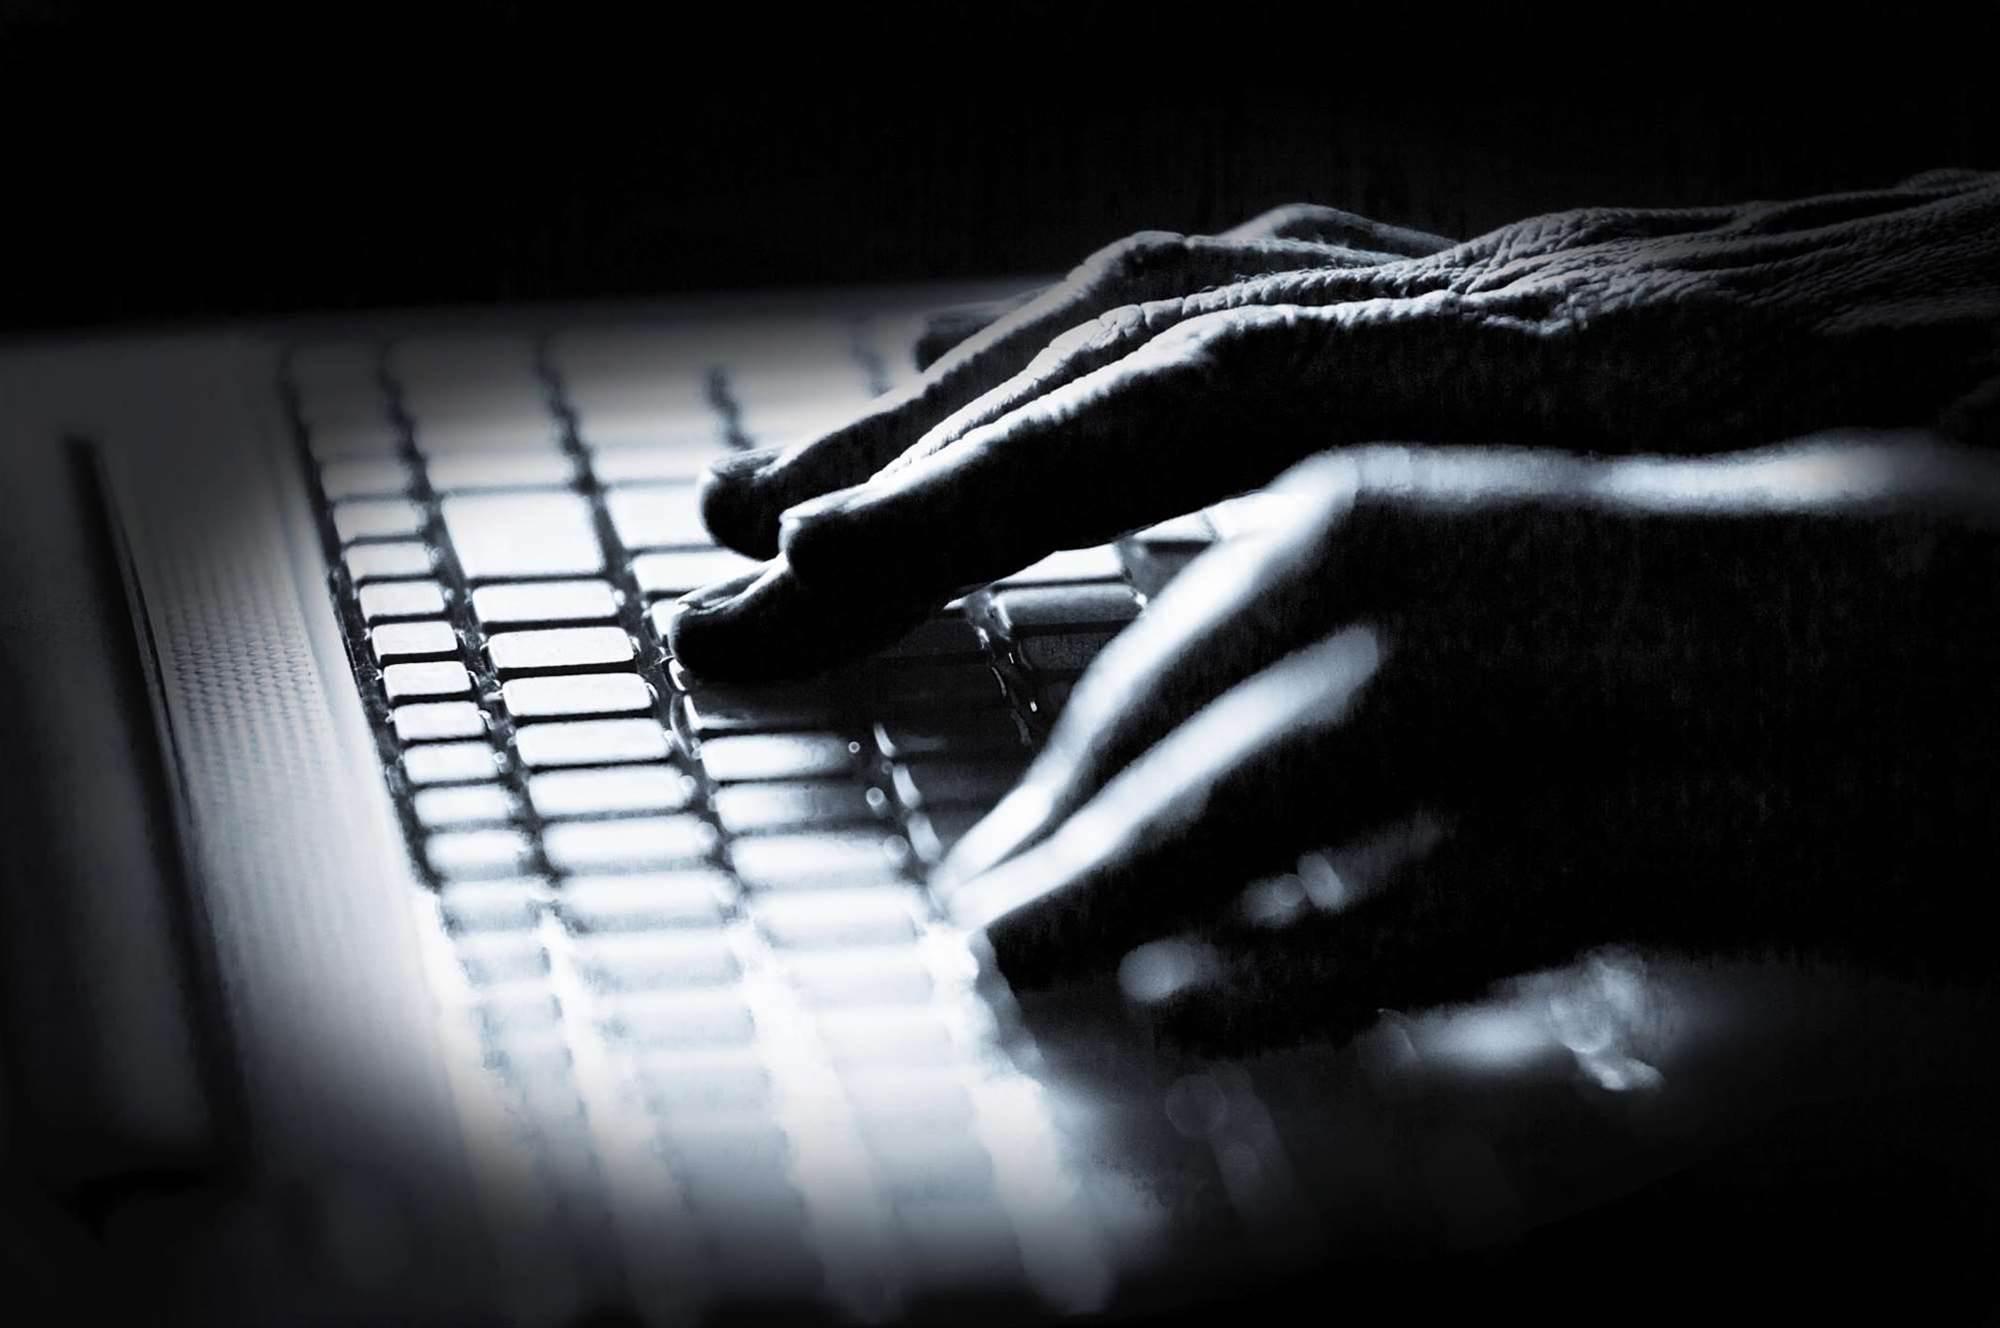 Online fraudsters top Aussie cybercrime blacklist